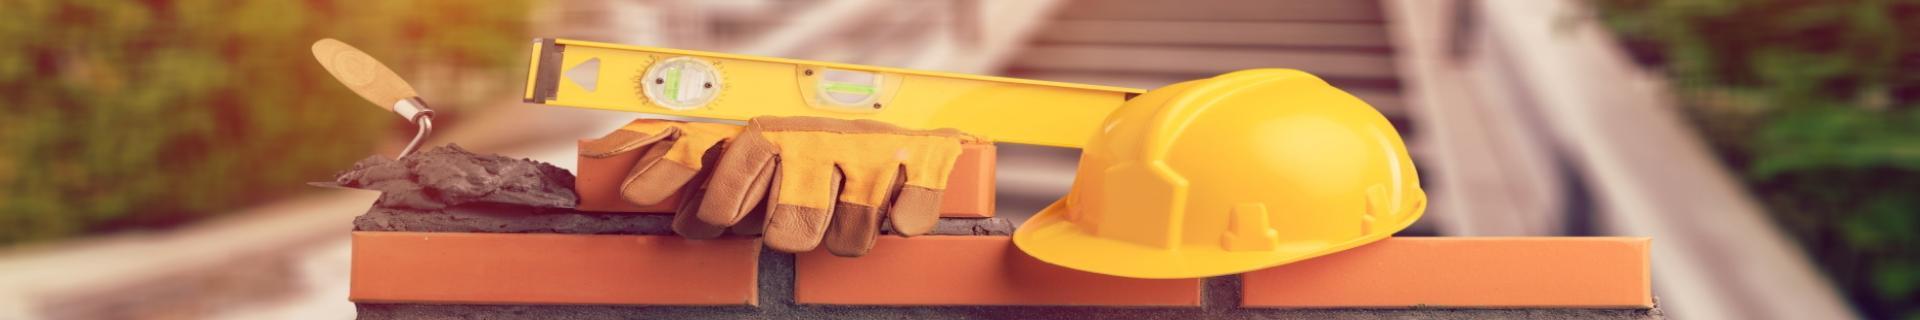 Personal Protective Equipment (Bundle)